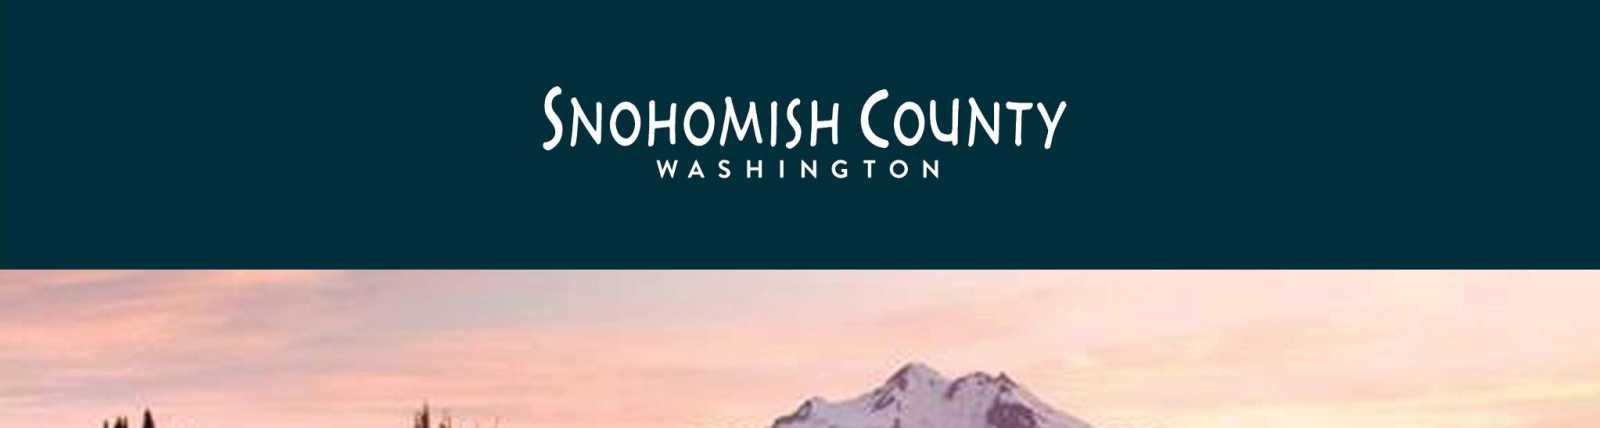 Snohomish County Tourism Bureau